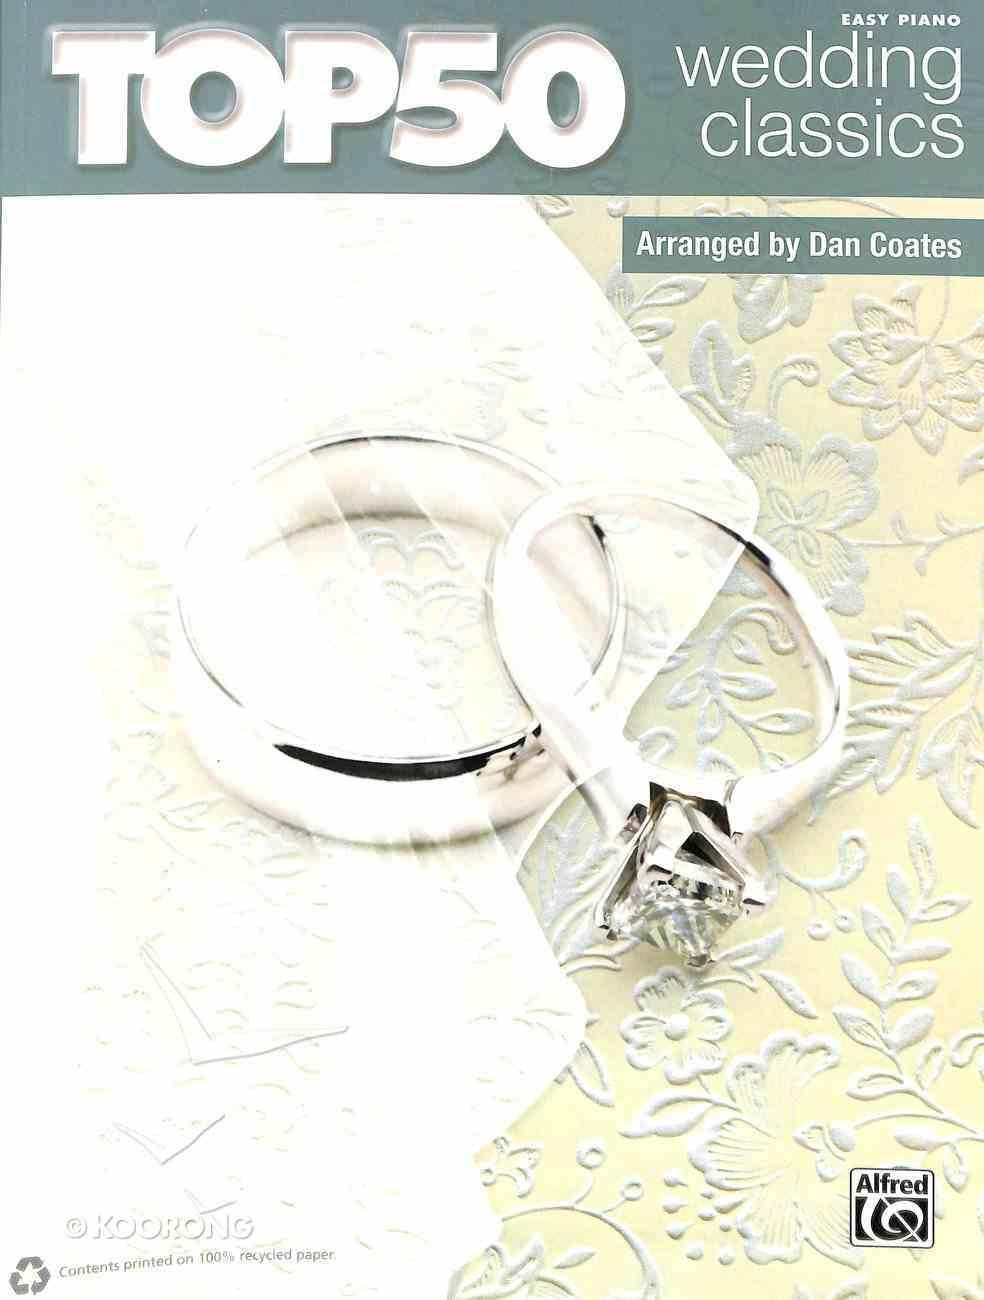 Top 50 Wedding Classics: Easy Piano (Music Book) Paperback